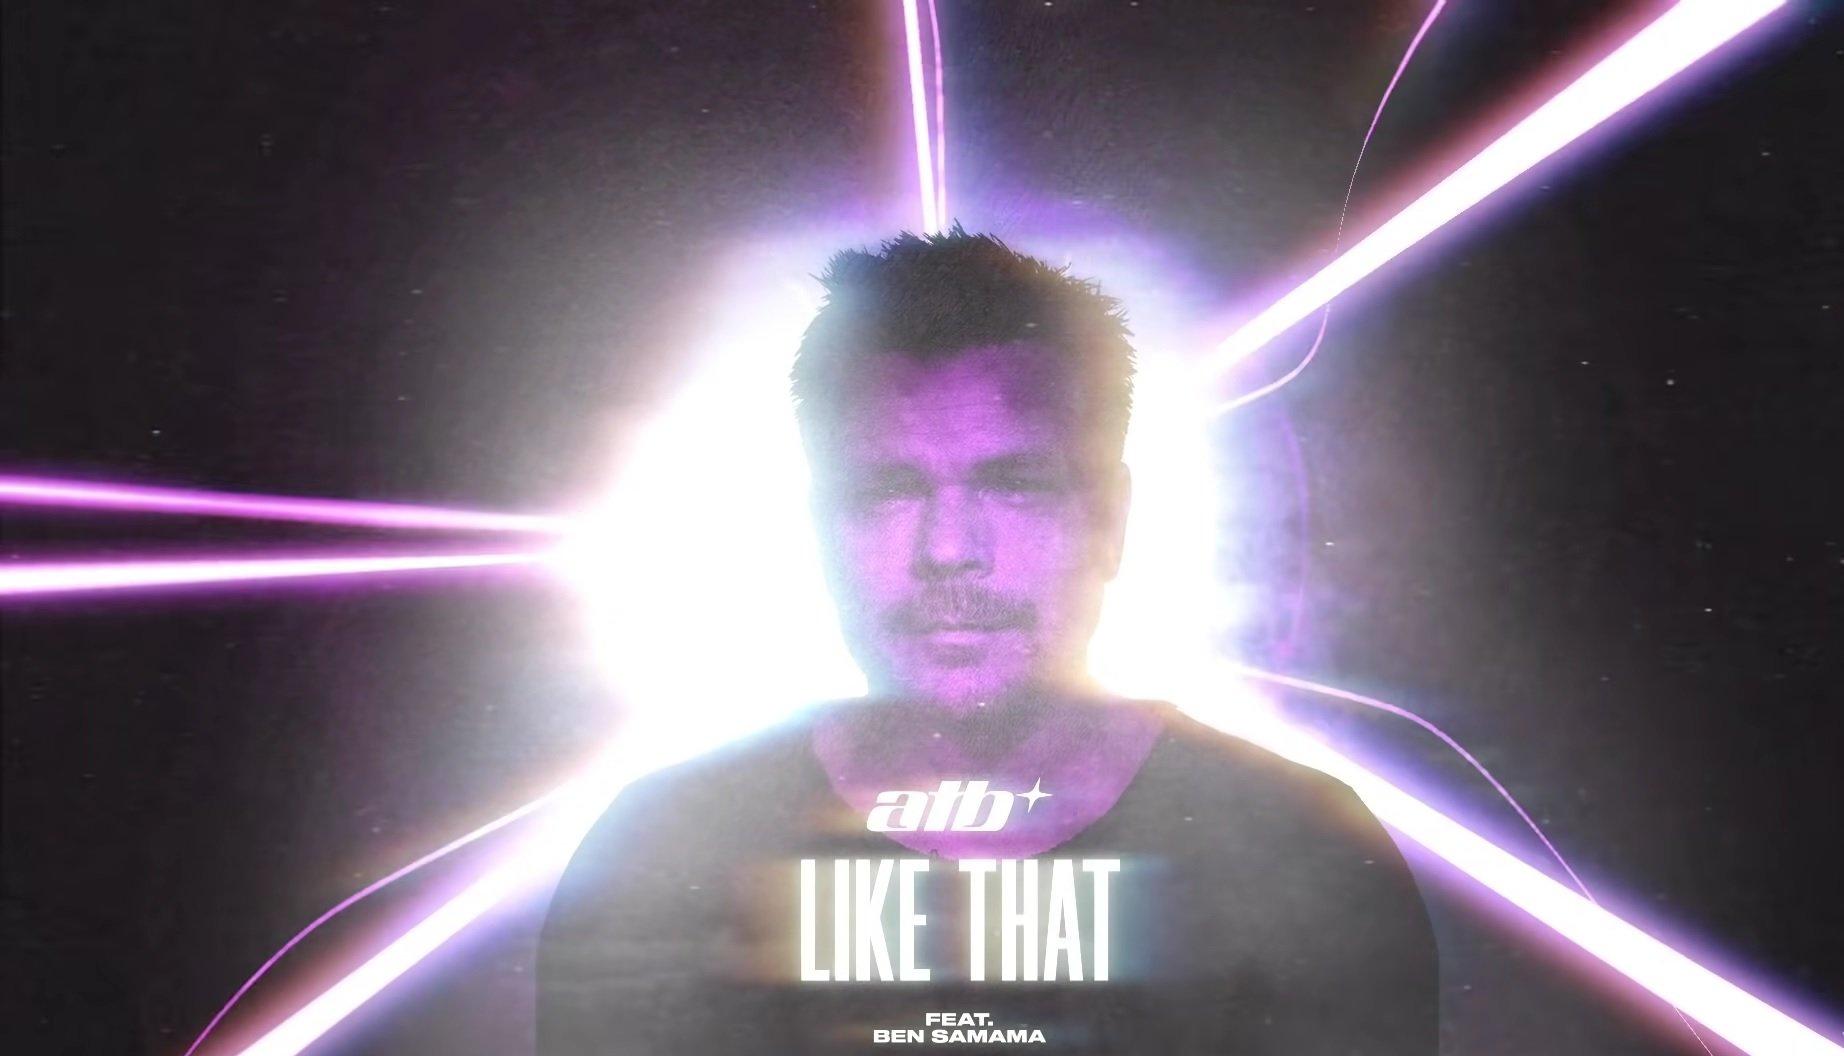 ATB Like That ft. Ben Samama